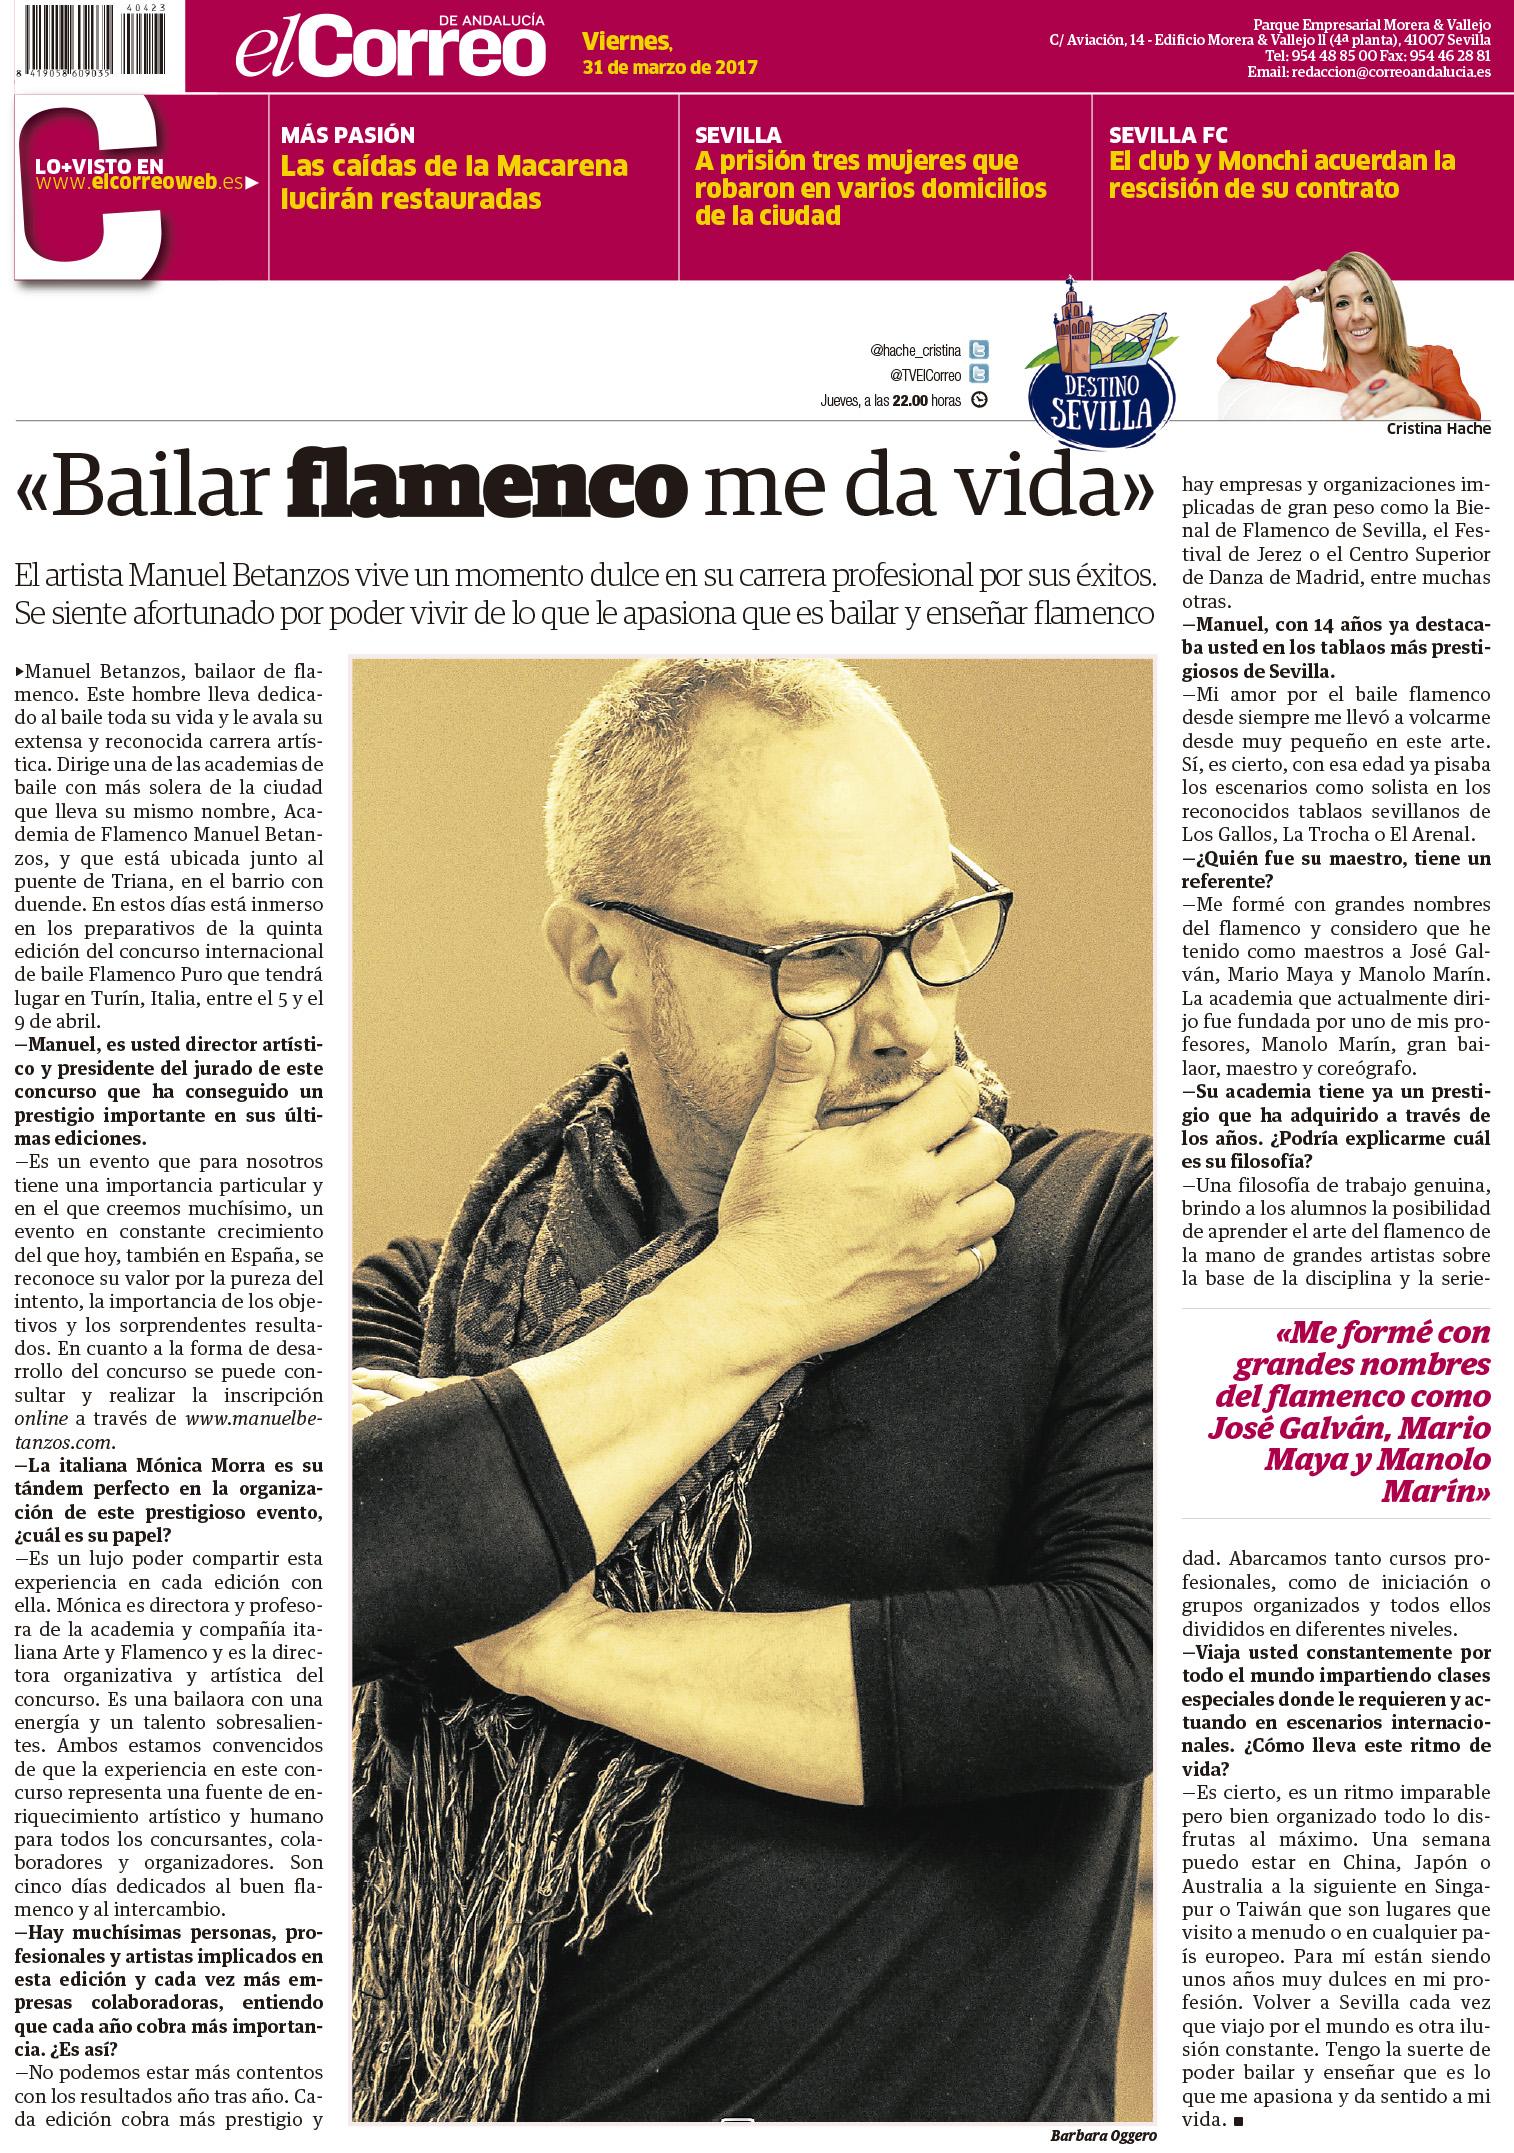 Bailar flamenco me da vida